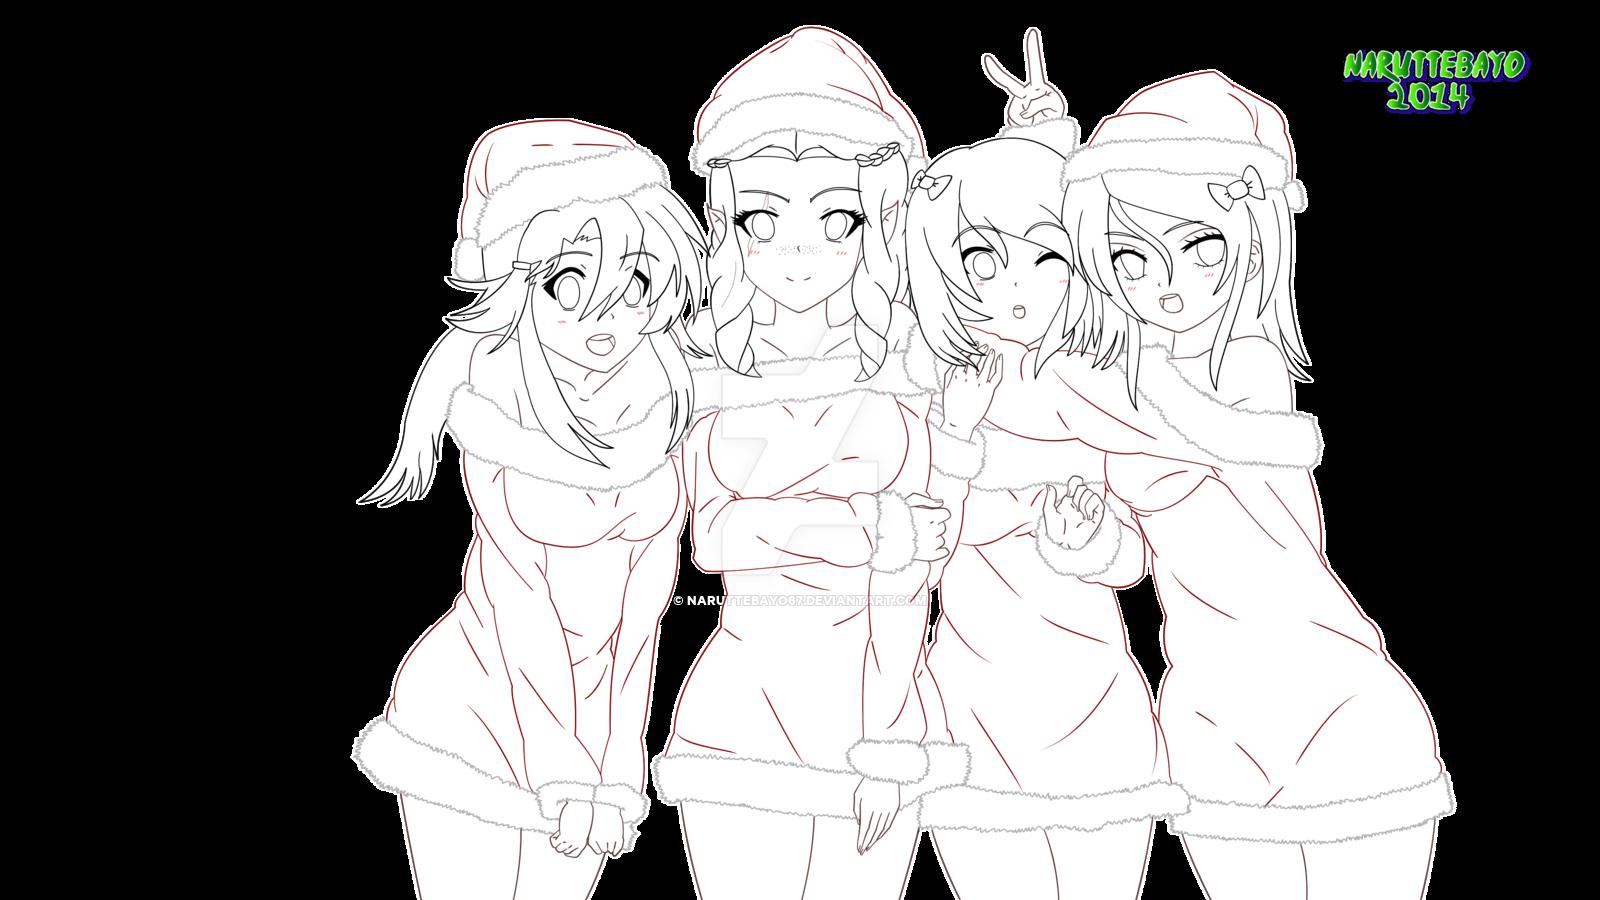 [lineart] - Oc's Christmas Girl 2014 by Naruttebayo67